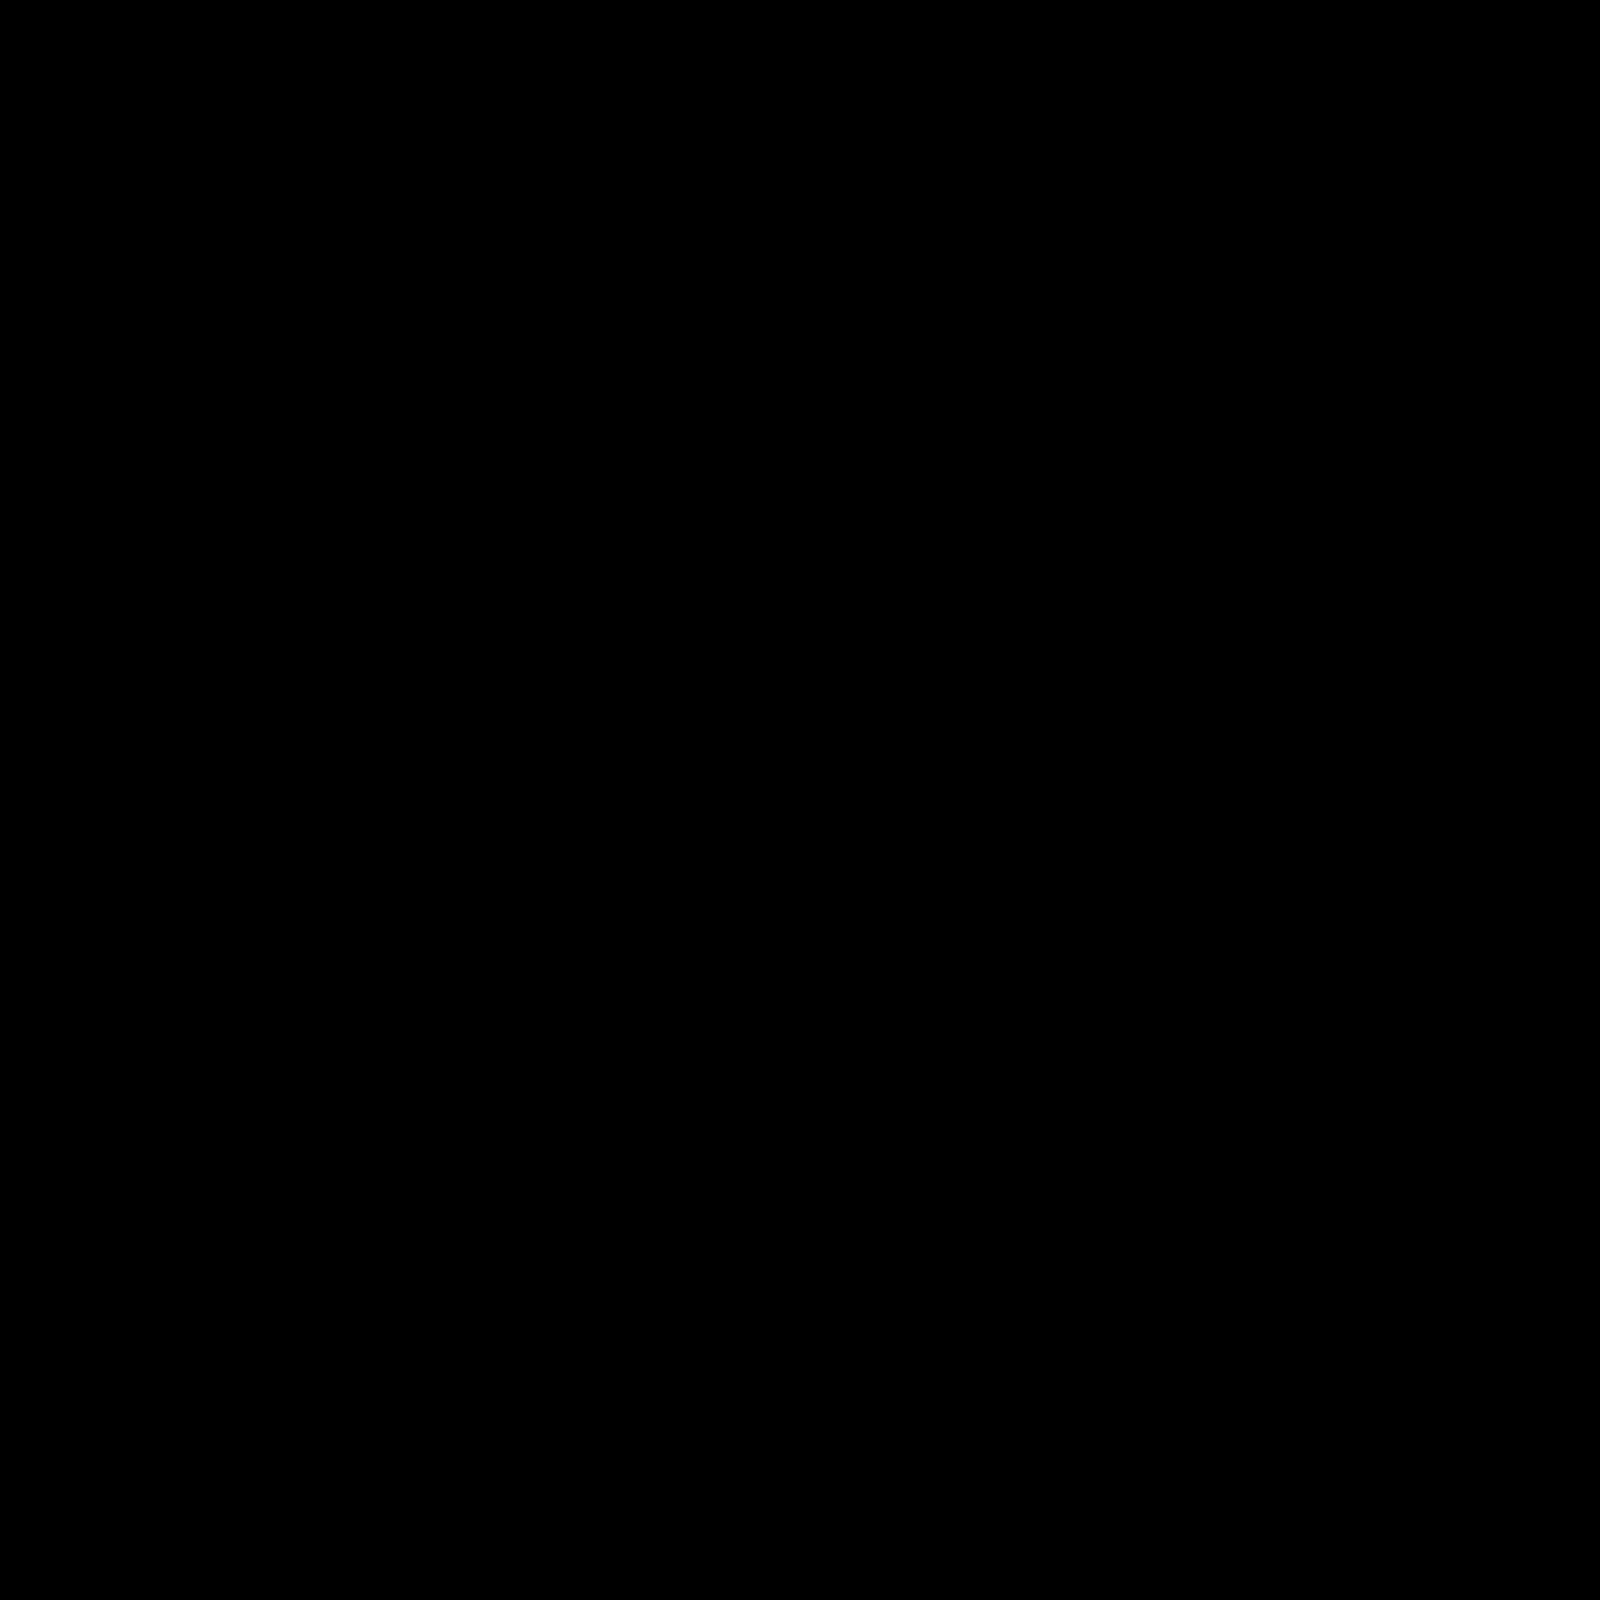 Clipart clock square. K templates best kclock